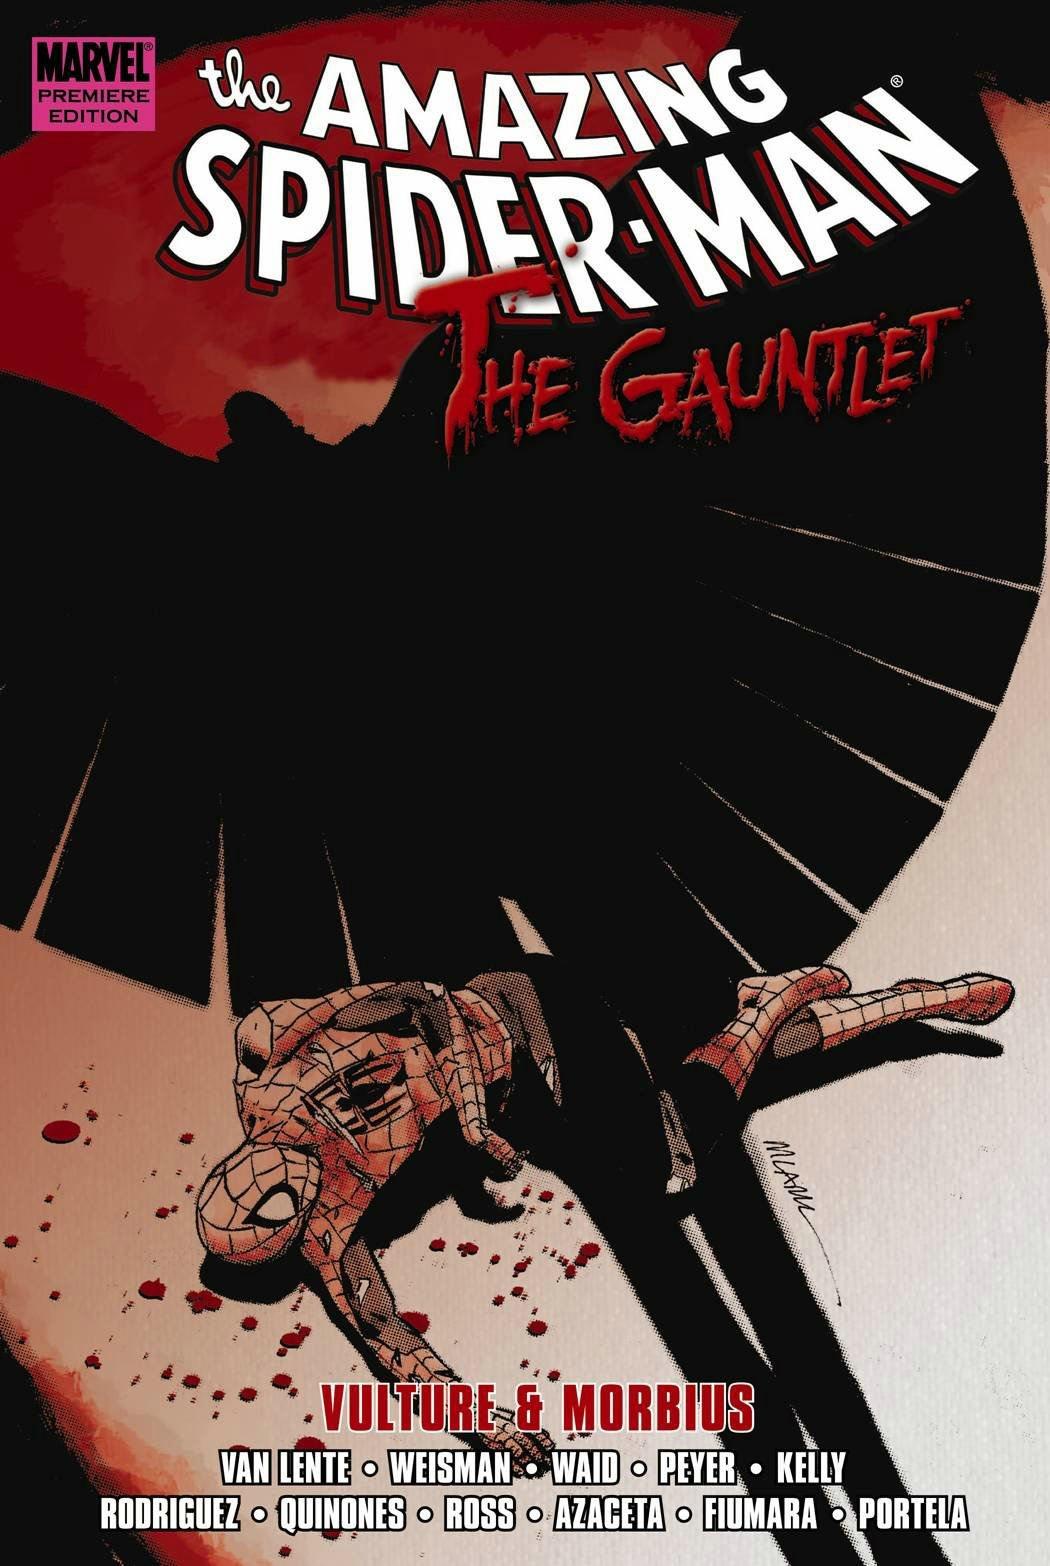 Read Online Spider-Man: The Gauntlet, Vol. 3 - Vulture & Morbius PDF